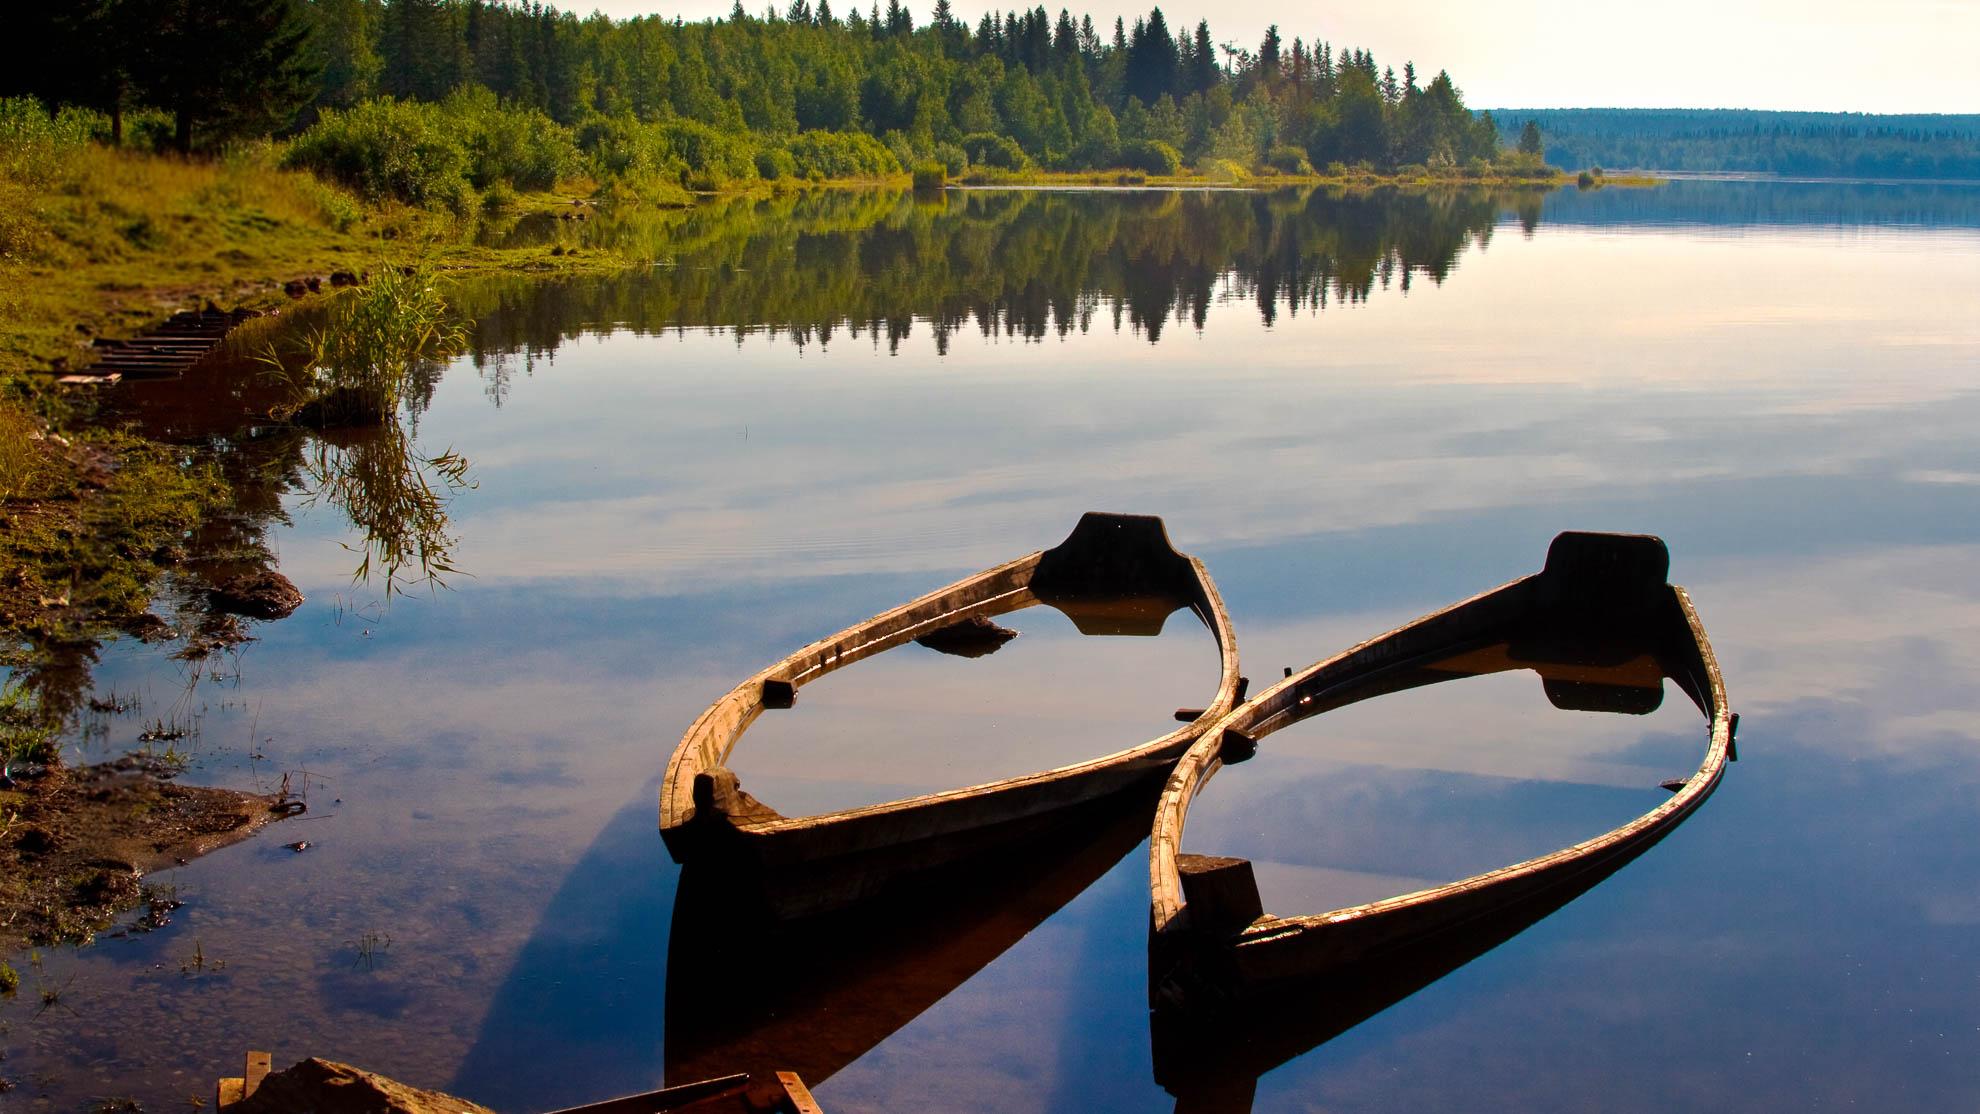 Фотограф Вадим Кукшинов. Озеро Зюраткуль